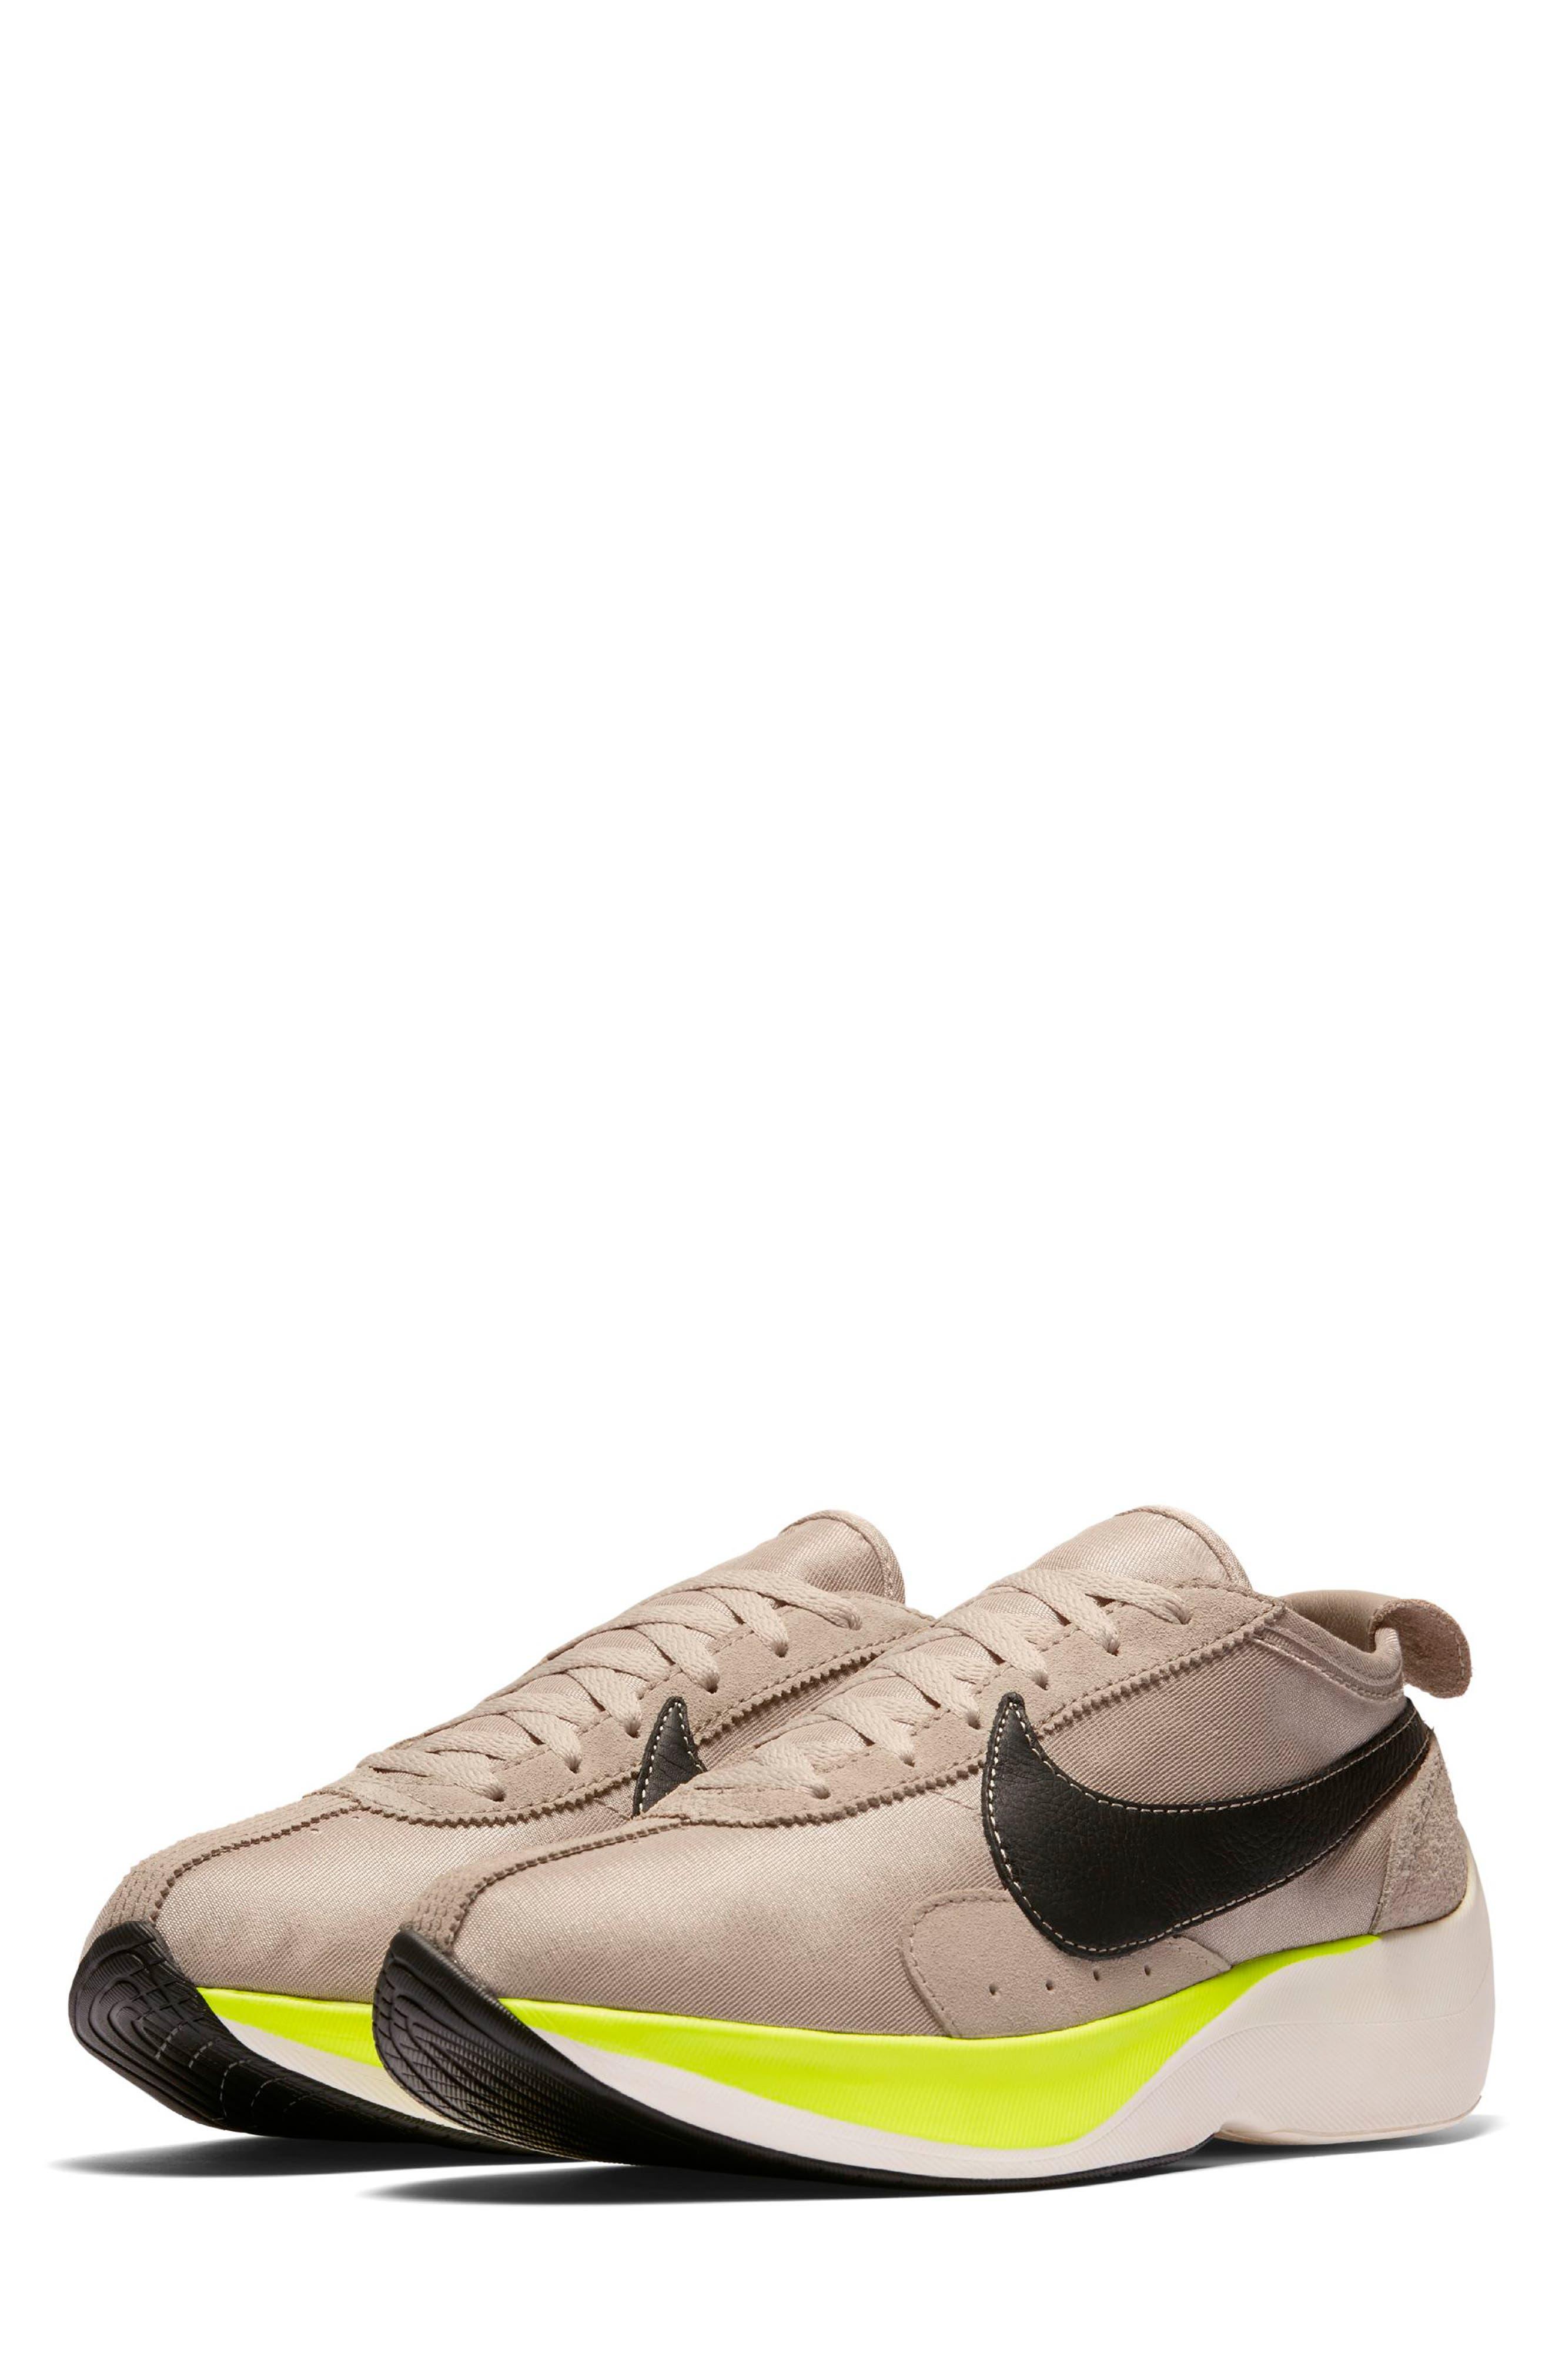 Moon Racer Sneaker,                         Main,                         color, STRING/ BLACK/ SAIL/ VOLT